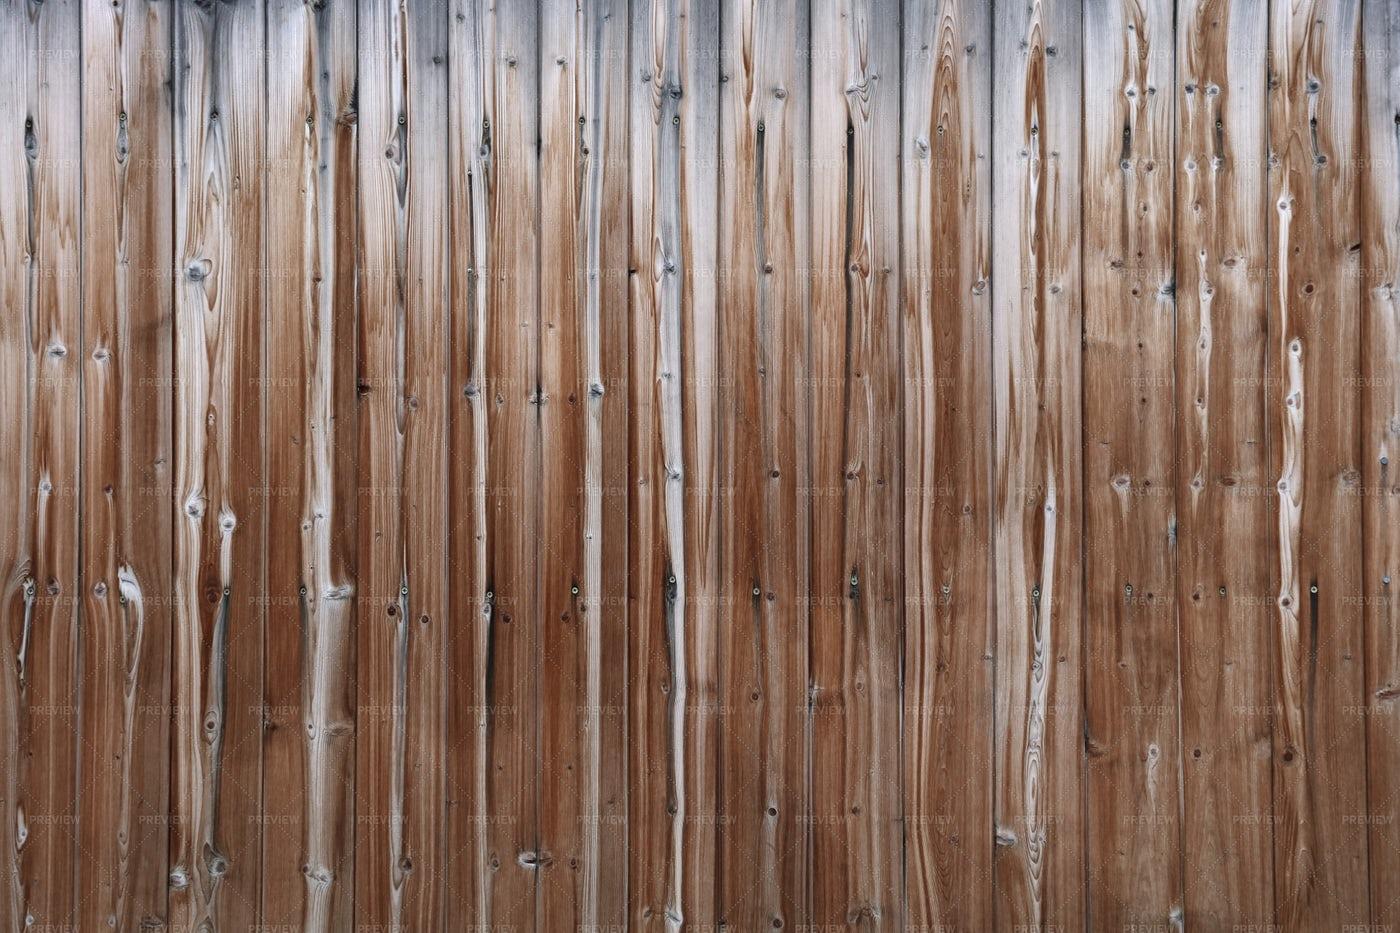 Vertical Wooden Planks: Stock Photos